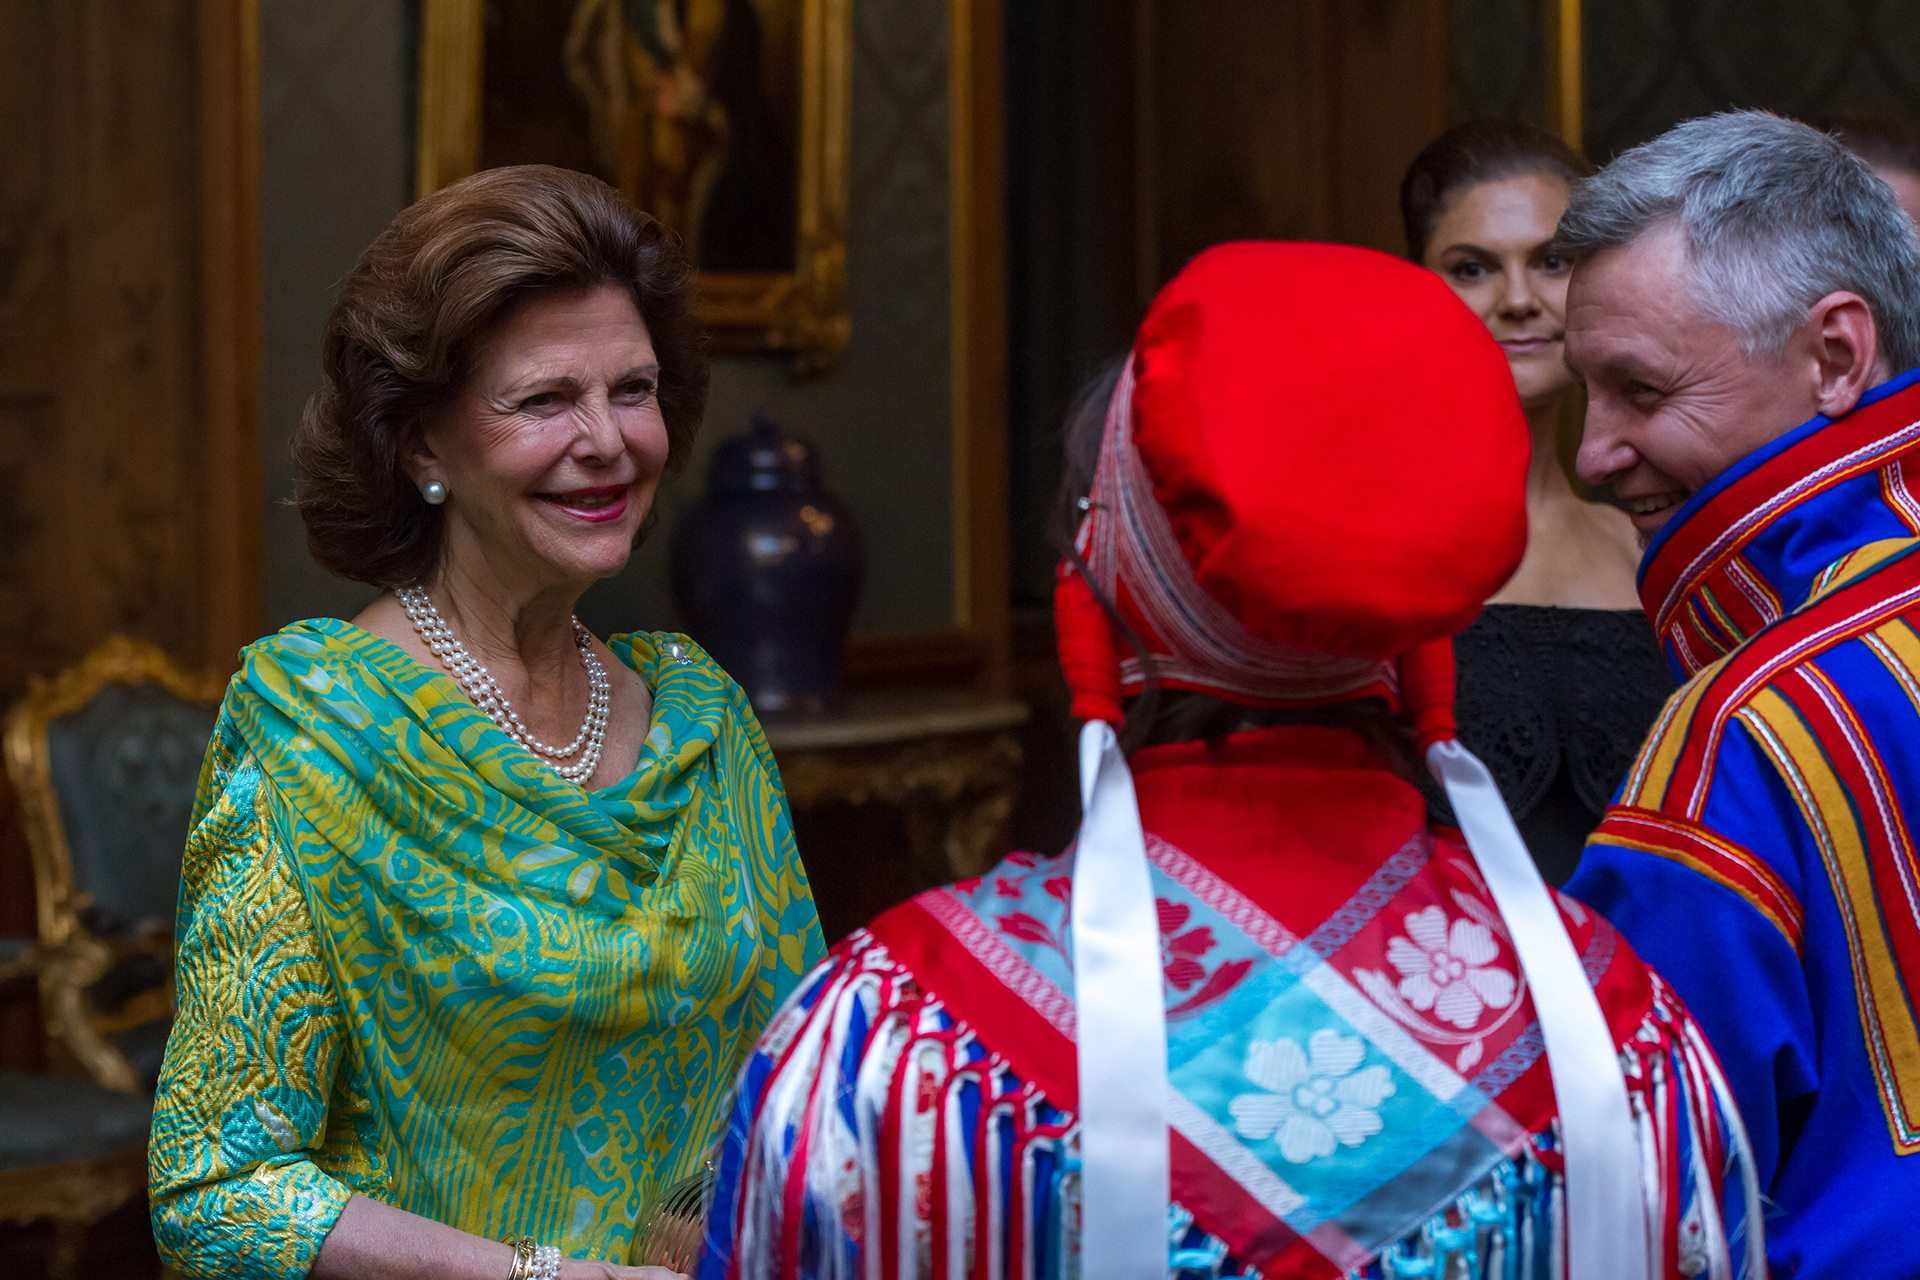 Königin Silvia begrüßt ihre ebenso farbenfroh gekleideten Gäste.  © Henrik Garlöv/Kungahuset.se